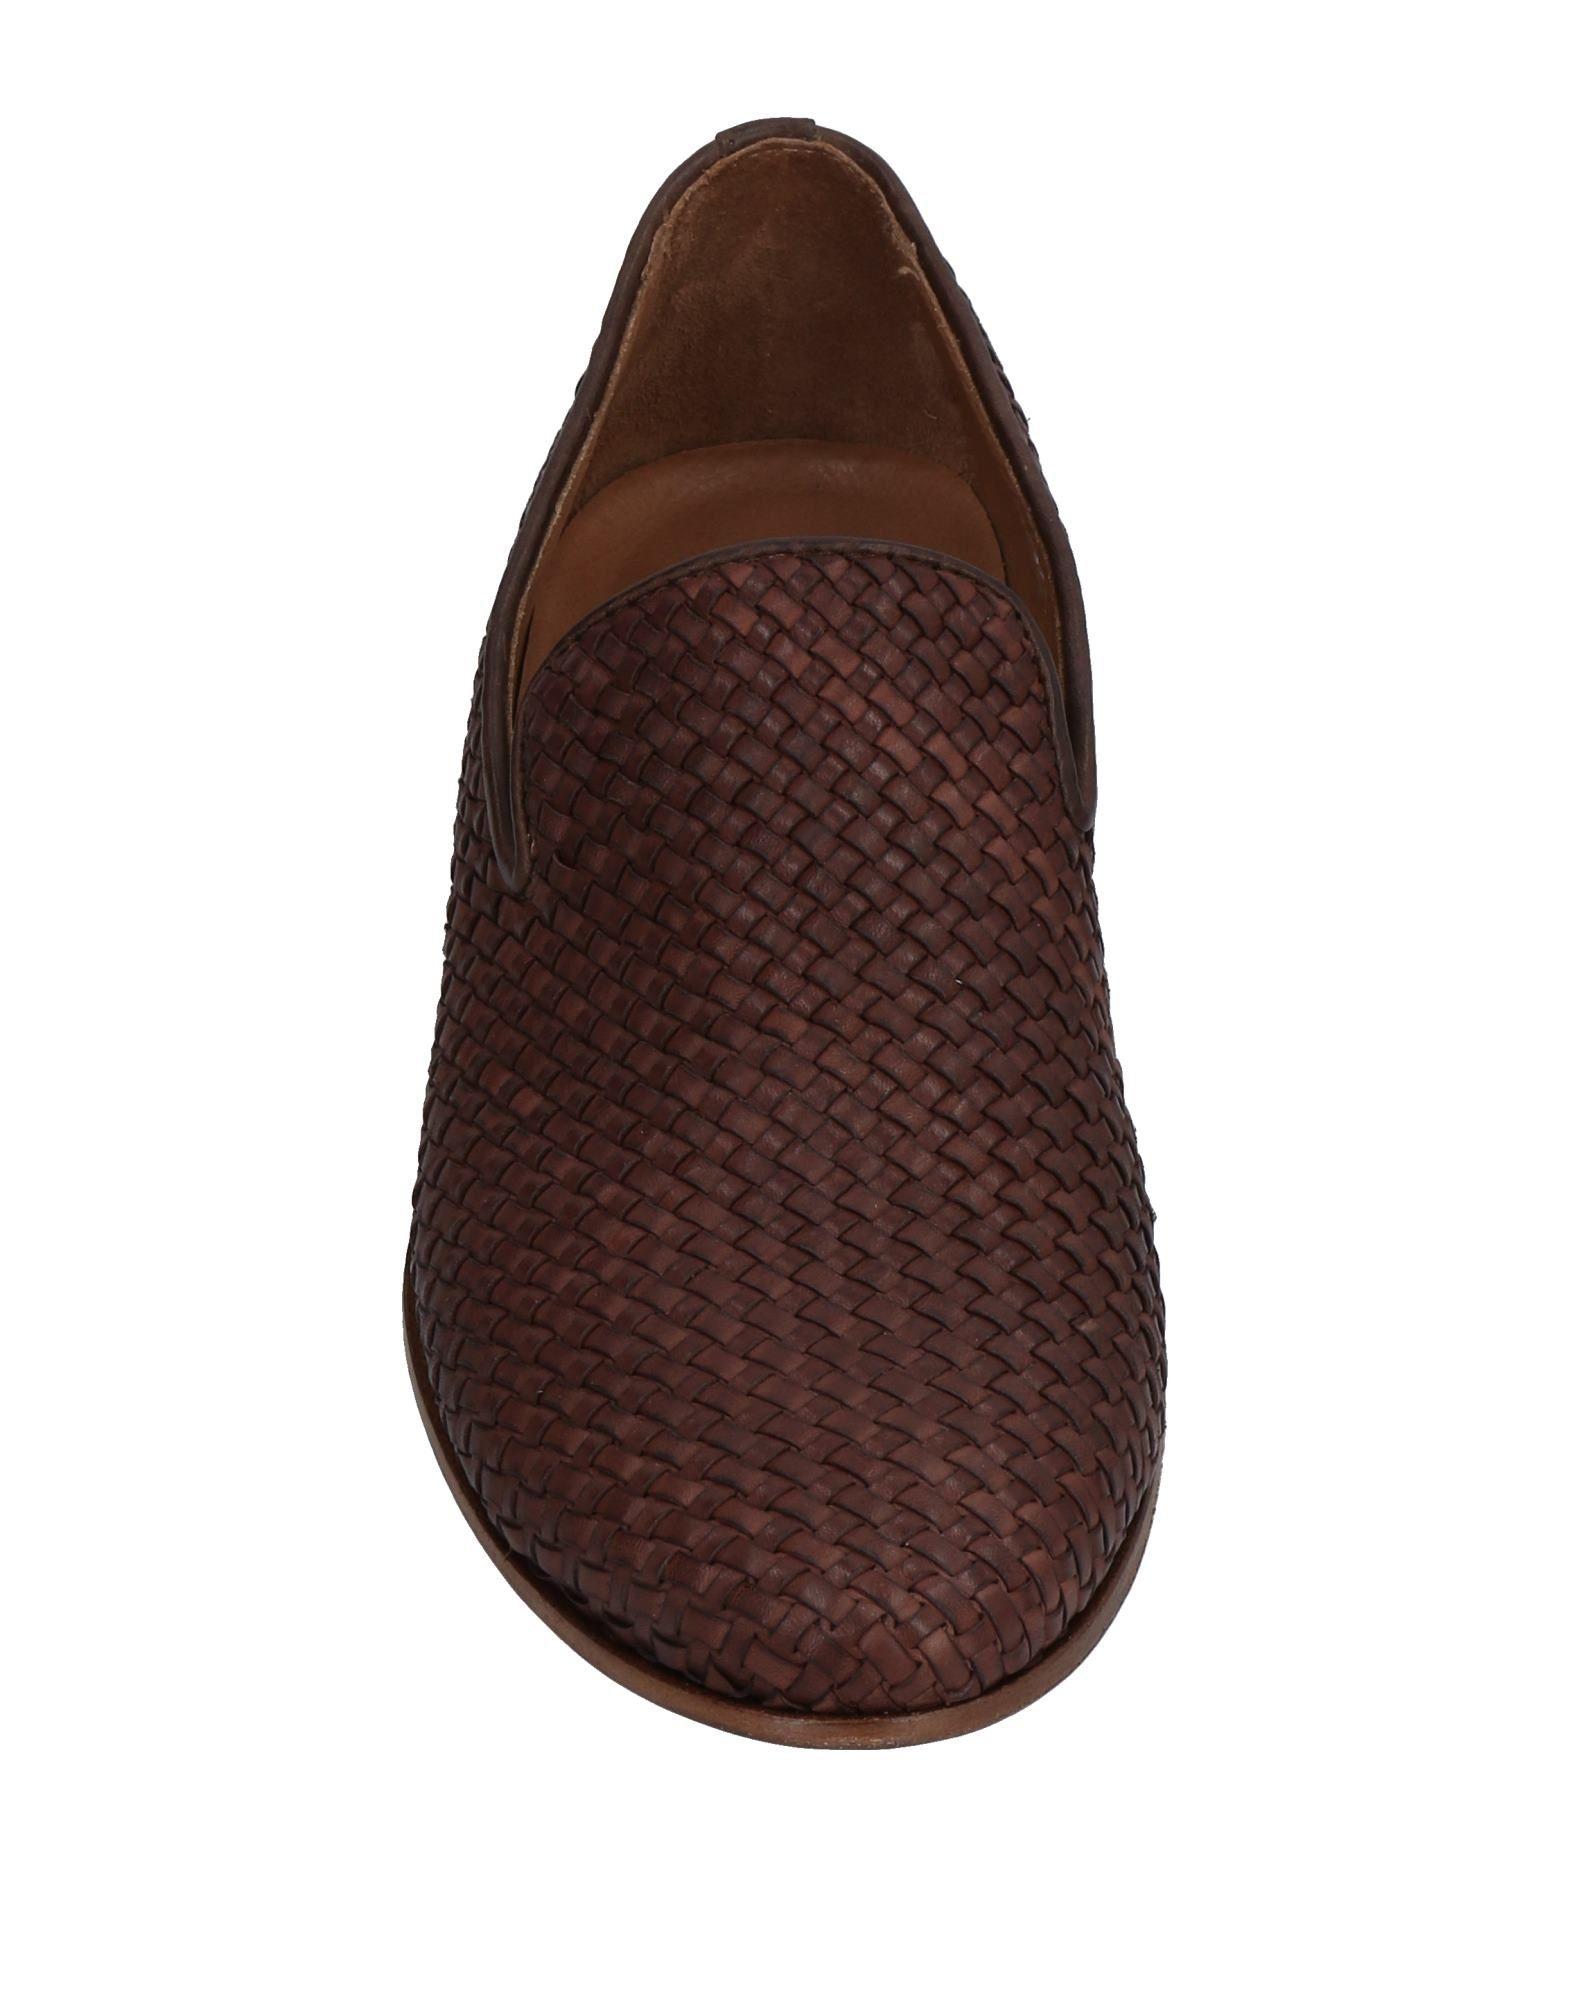 Buttero® Mokassins Qualität Herren  11194730GF Gute Qualität Mokassins beliebte Schuhe 490798